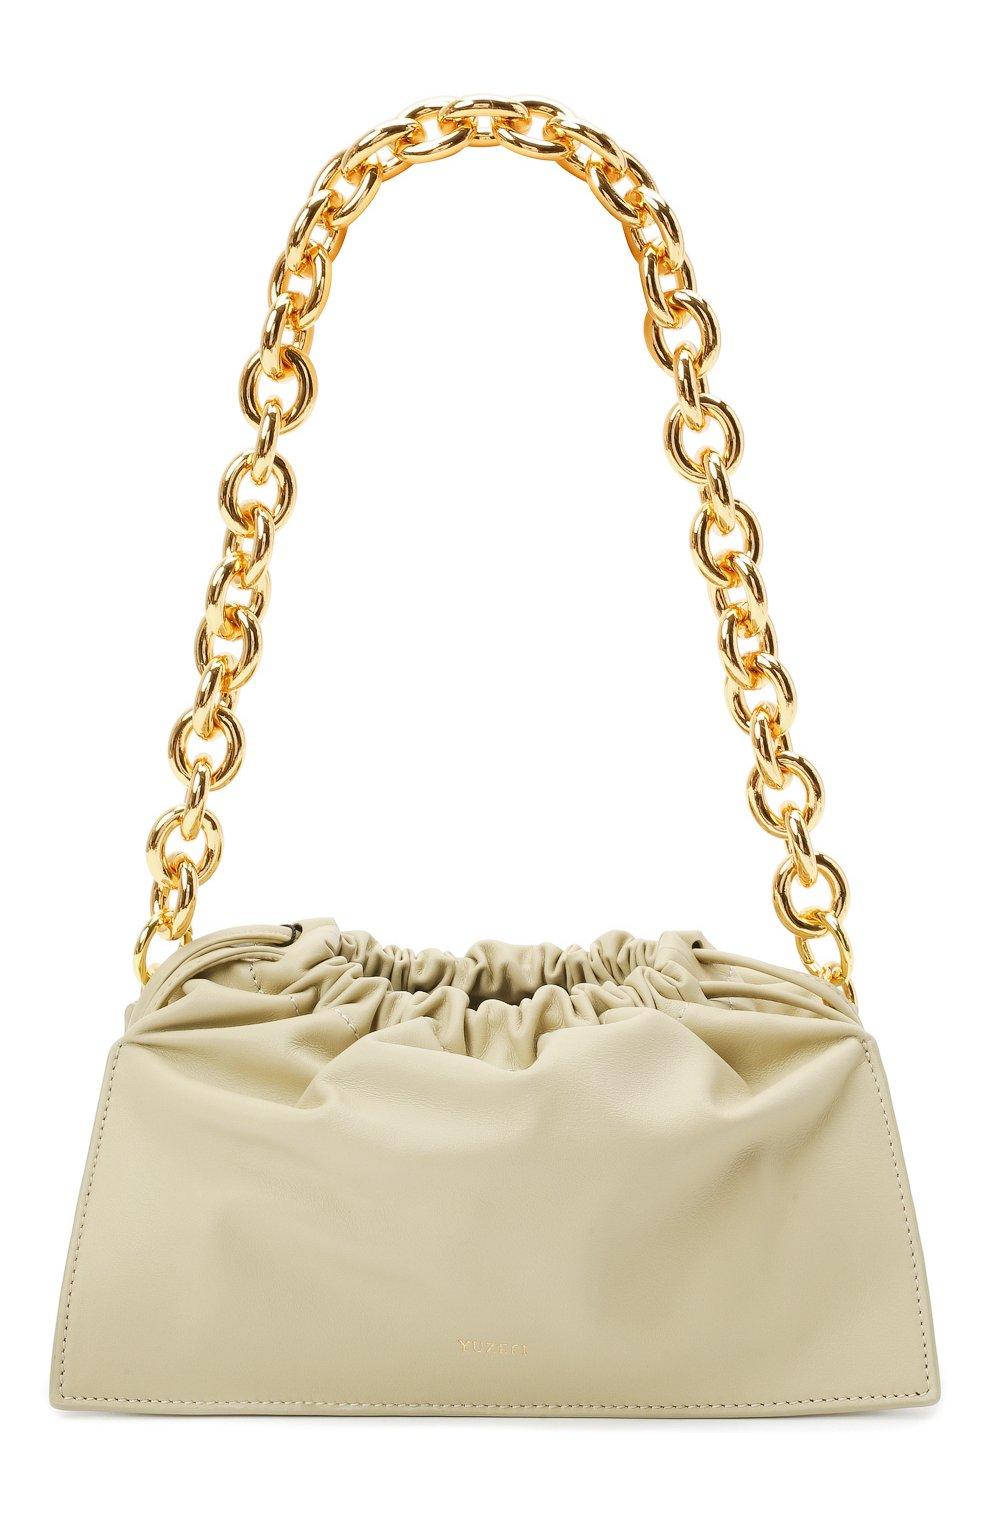 Женская сумка bom YUZEFI светло-зеленого цвета, арт. YUZIC0-HB-B0-13 | Фото 1 (Сумки-технические: Сумки top-handle; Материал: Натуральная кожа; Ремень/цепочка: На ремешке; Размер: small)